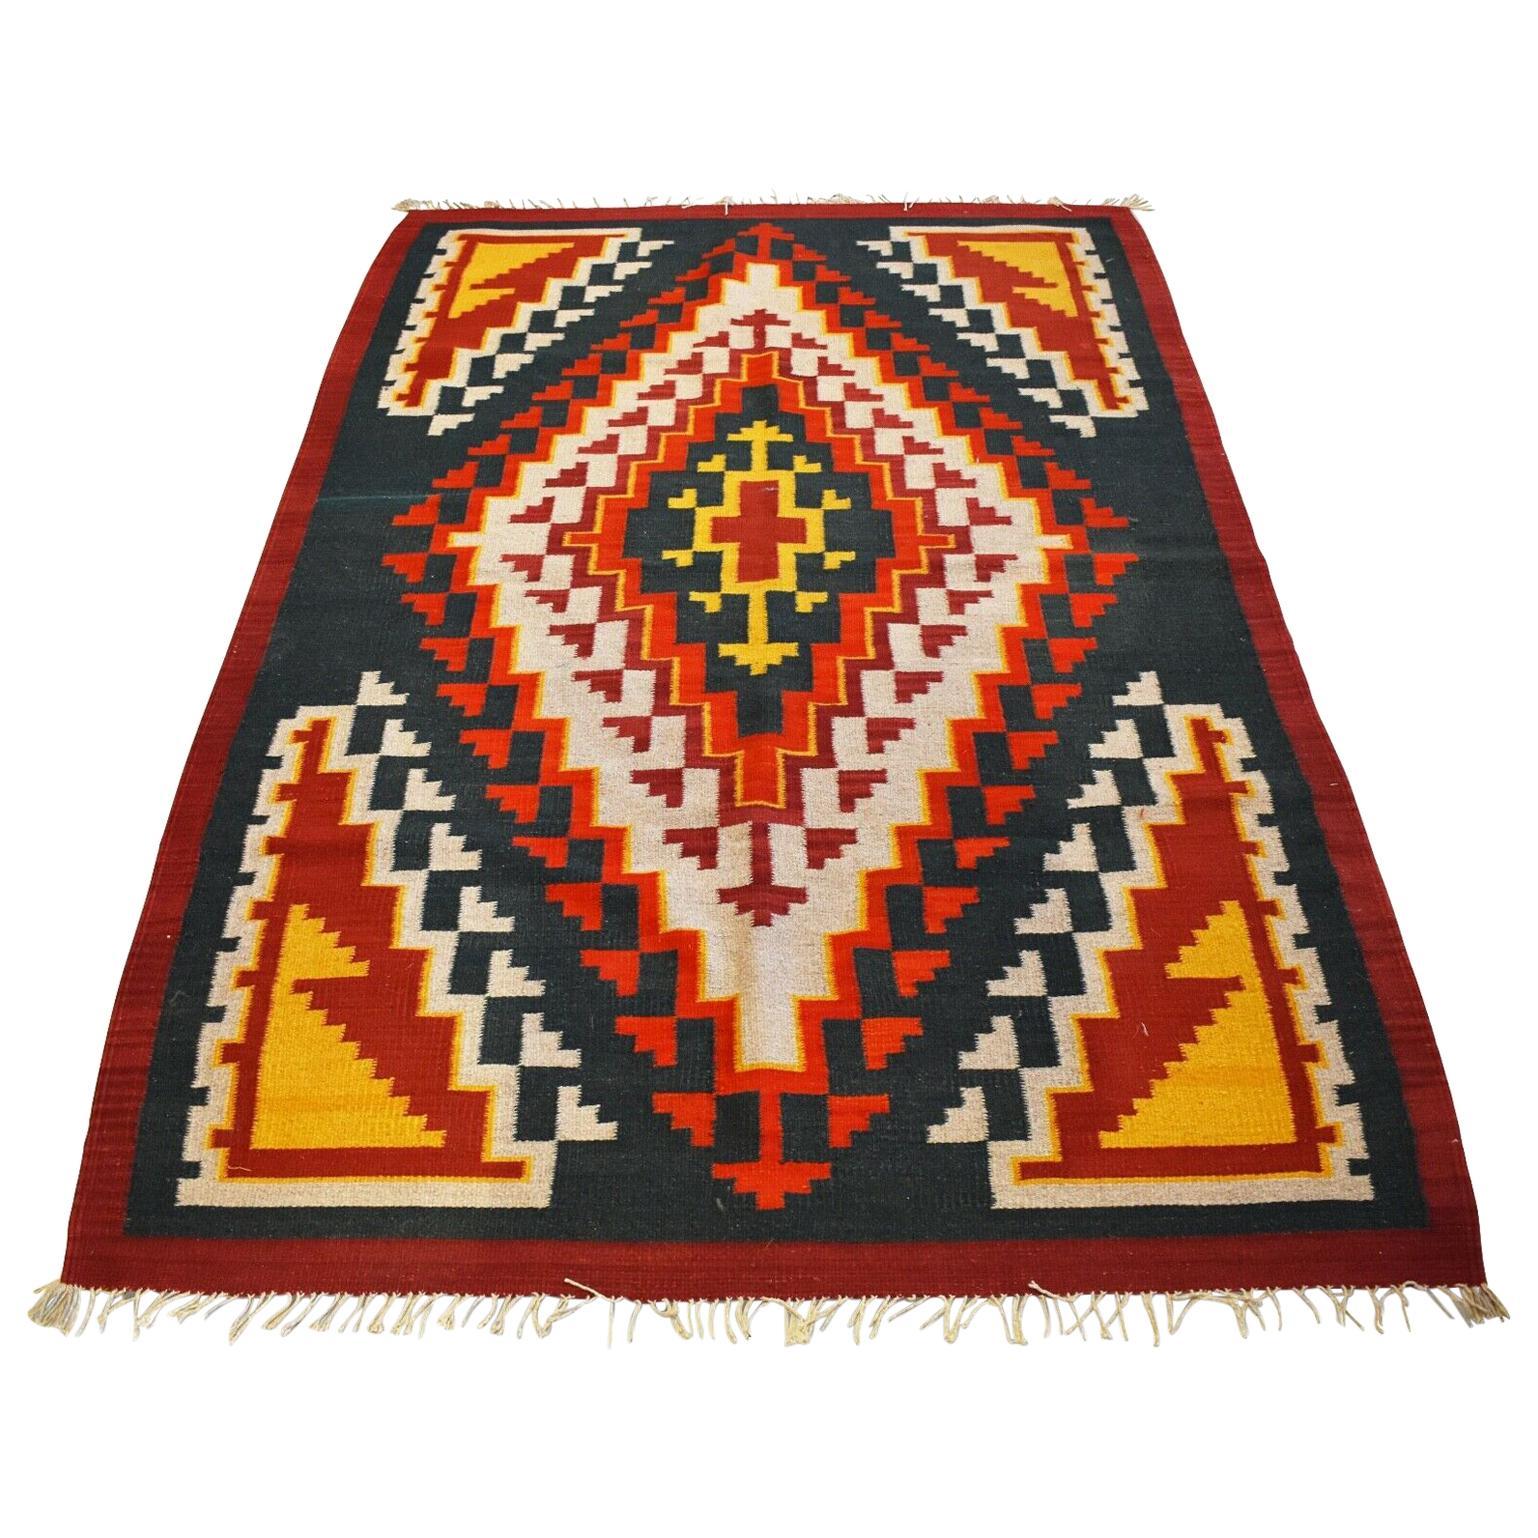 Vintage Handwoven Kilim Rug / Runner Natural Dye